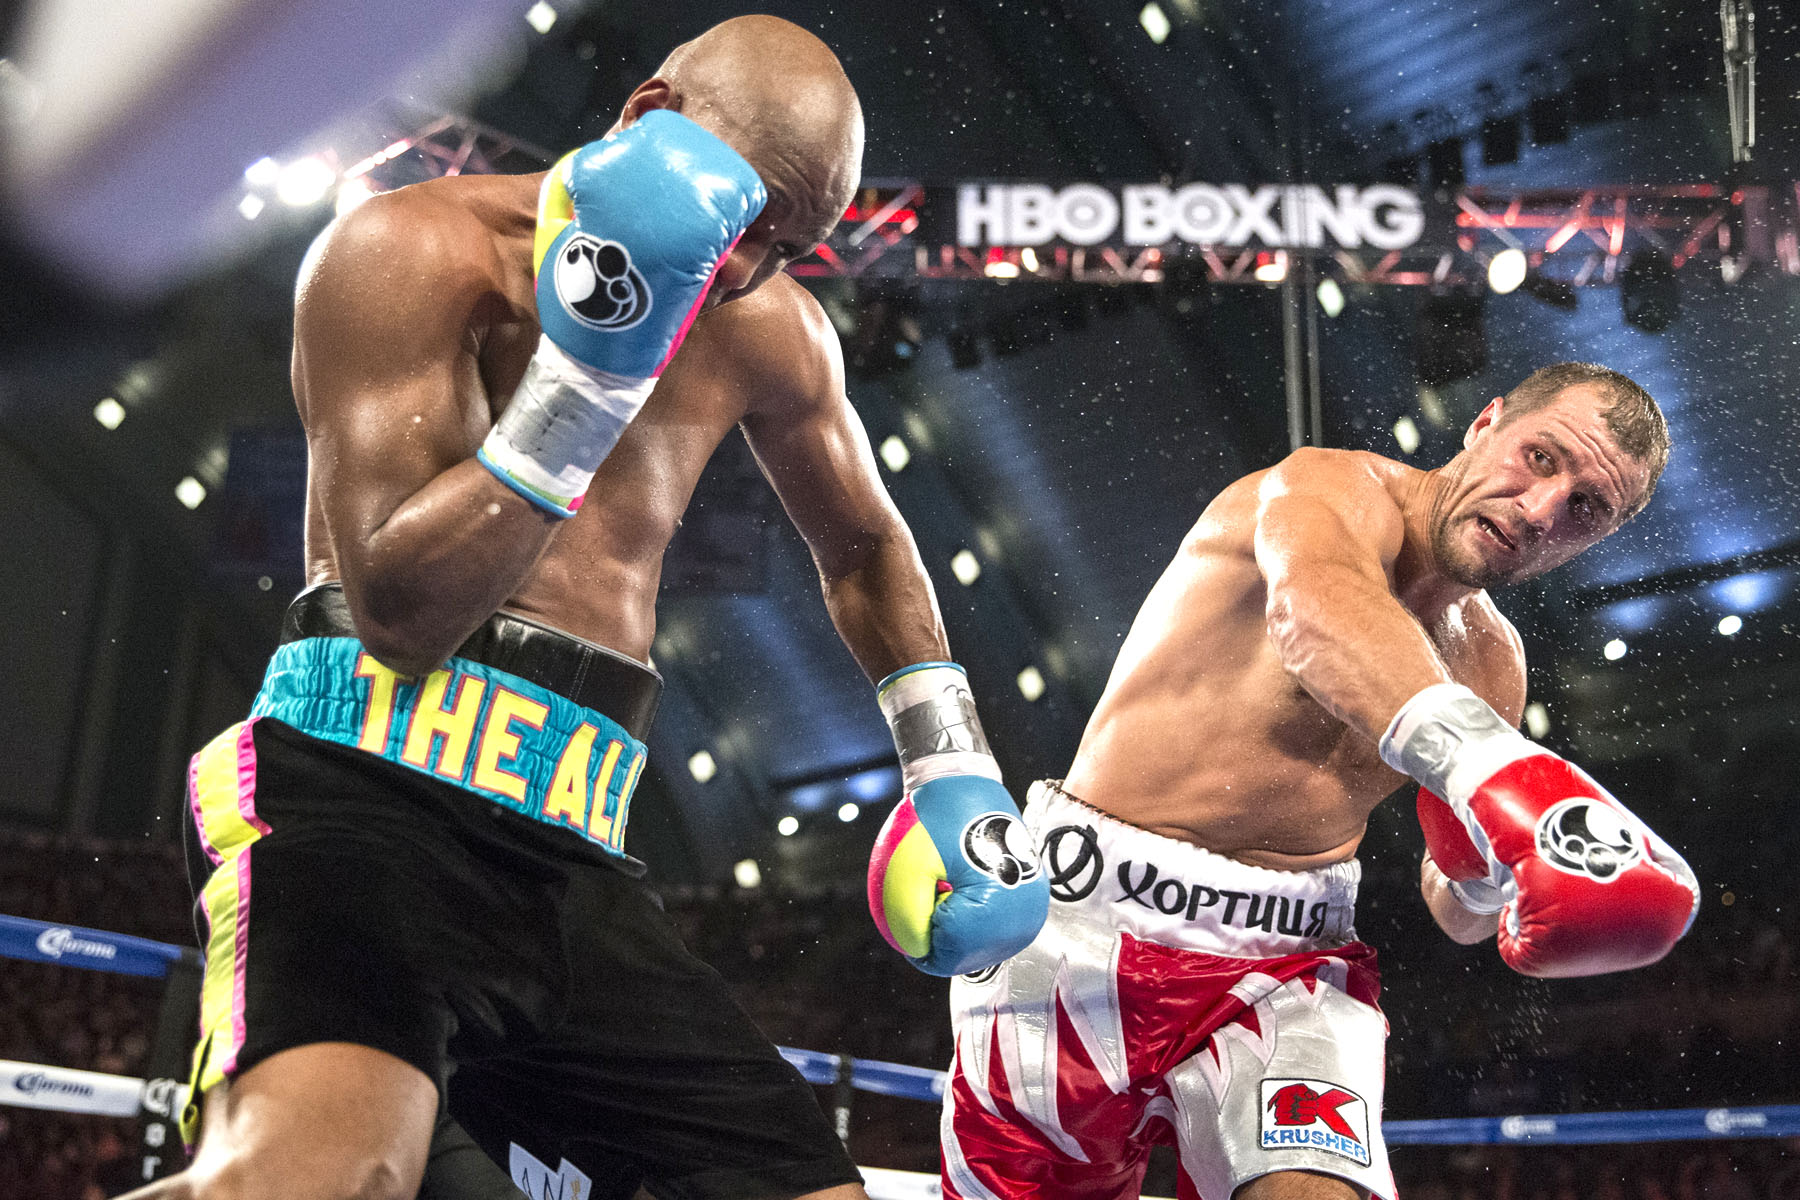 Bernard Hopkins, Sergei Kovalev, Boxing Wallpaper, HD Sports 4K Wallpapers, Images, Photos And